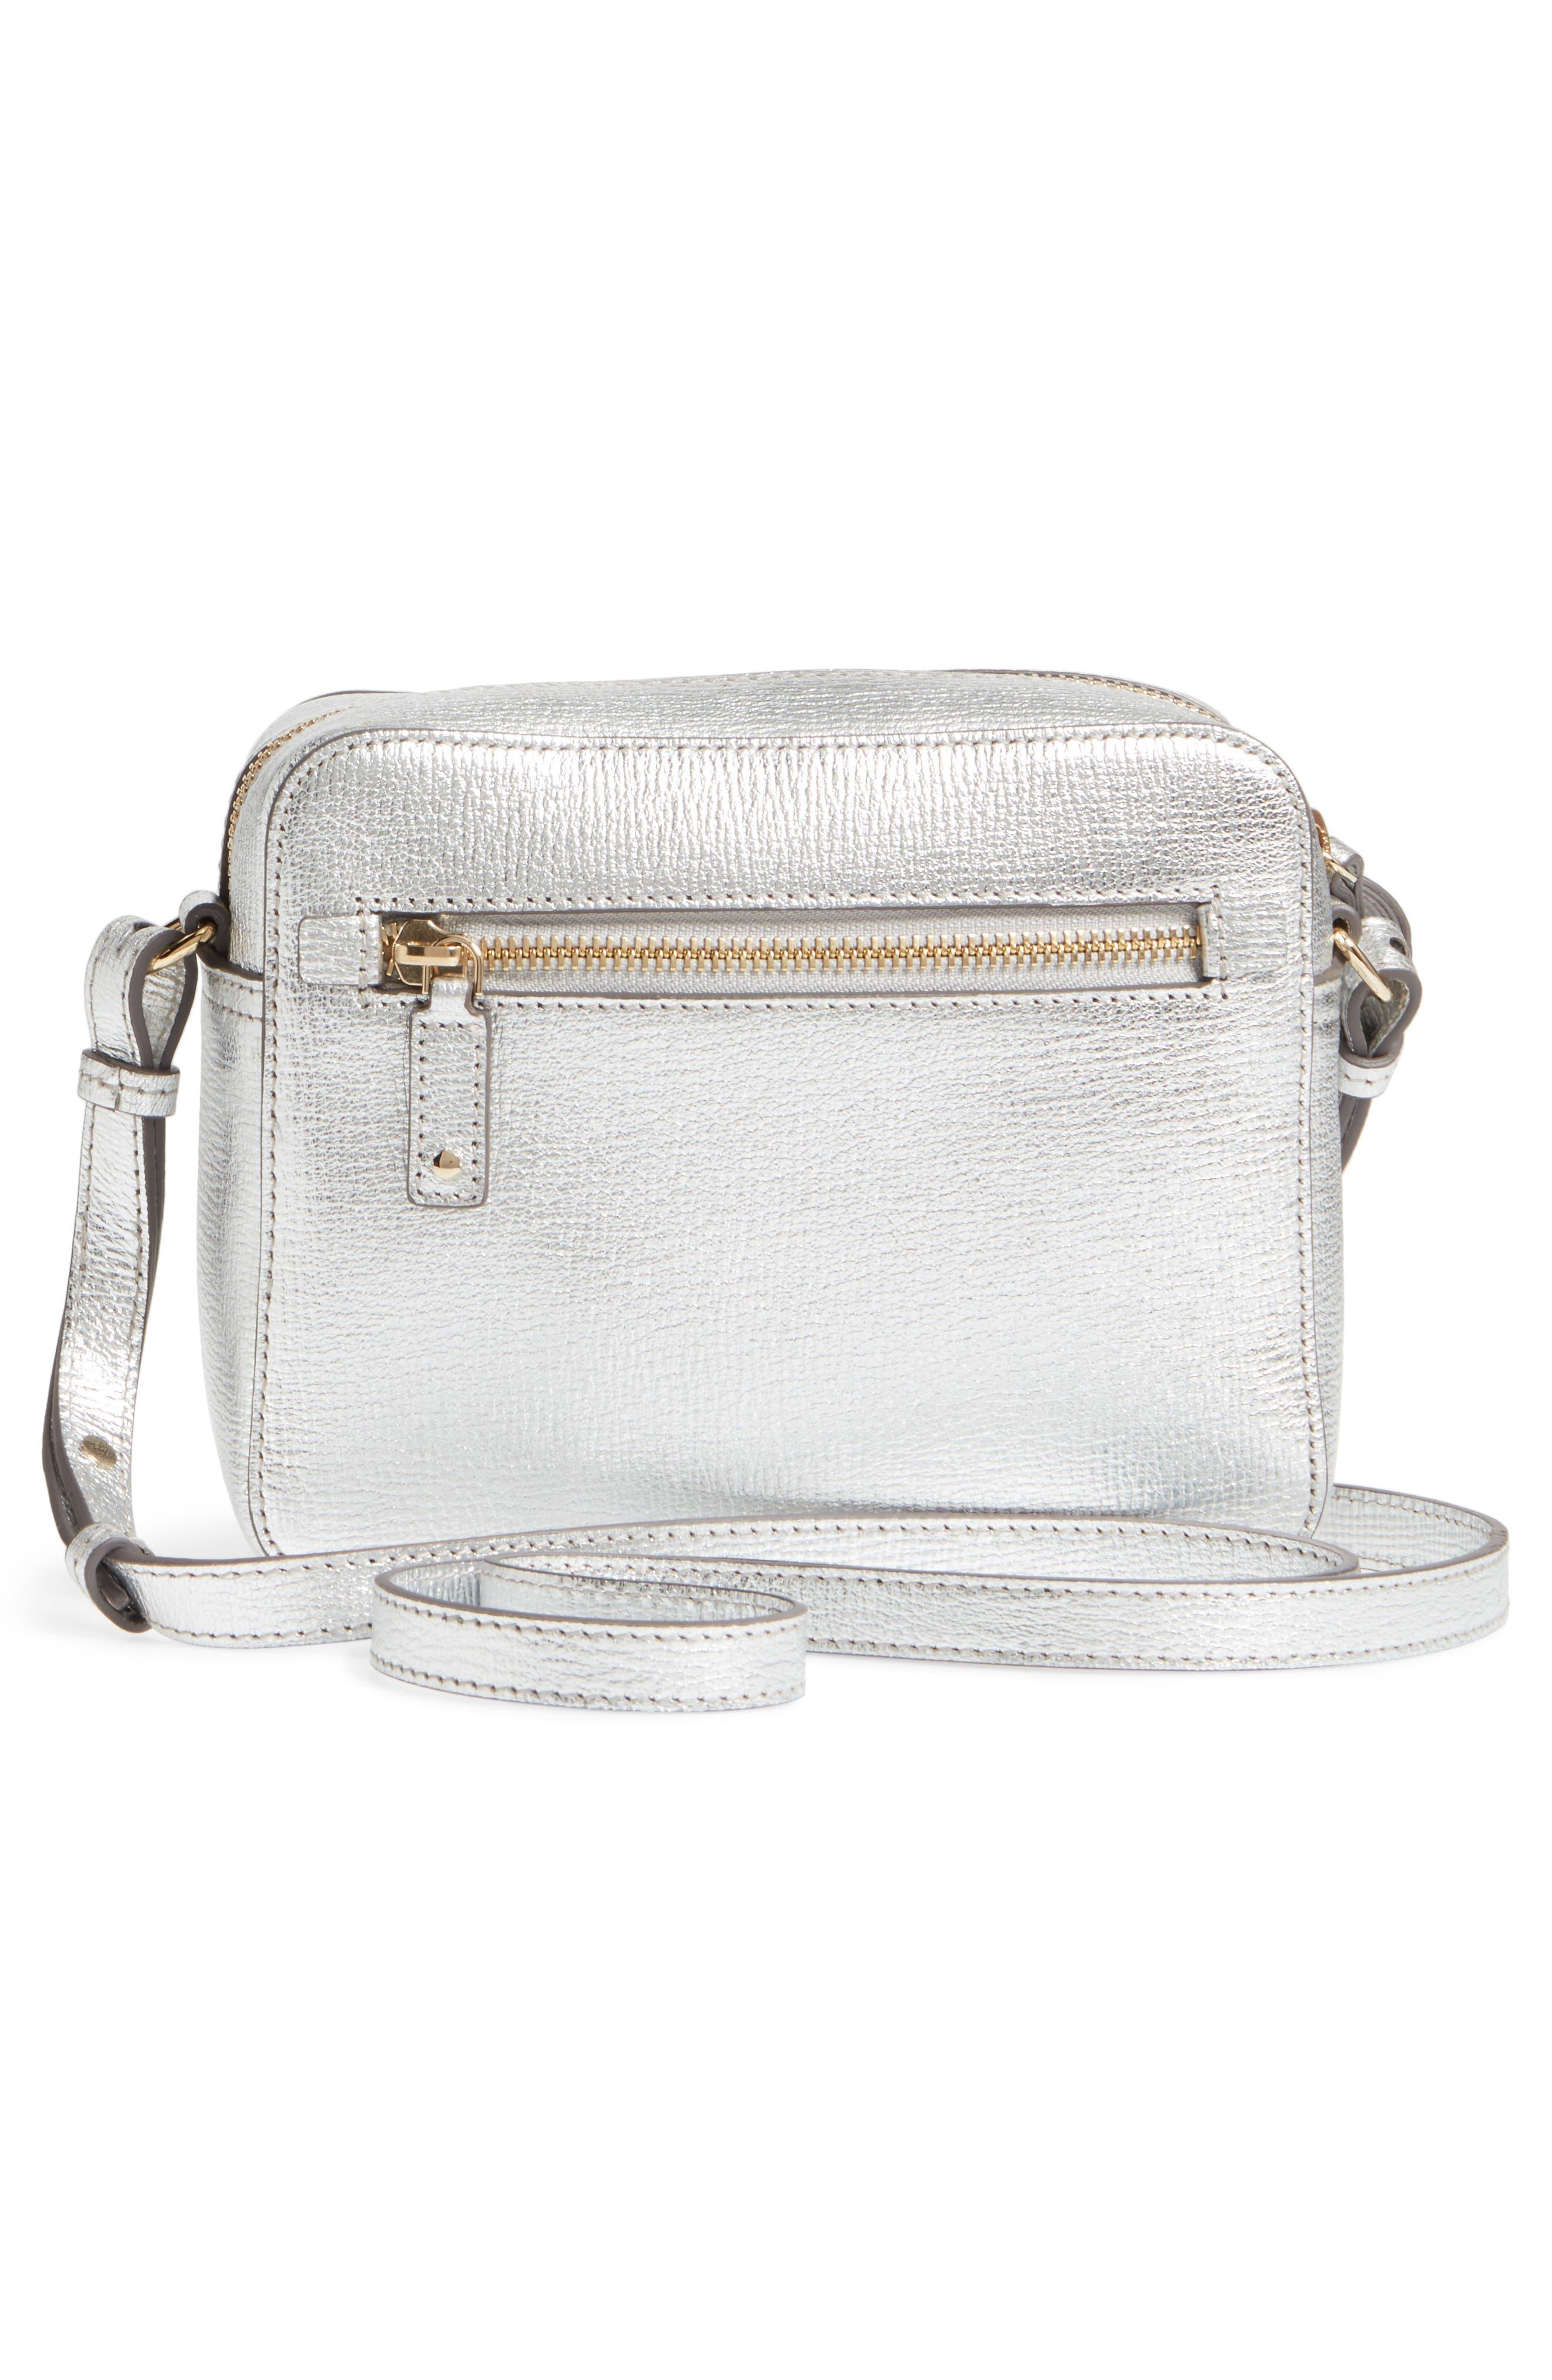 Smiley Metallic Leather Crossbody Bag,                             Alternate thumbnail 3, color,                             040